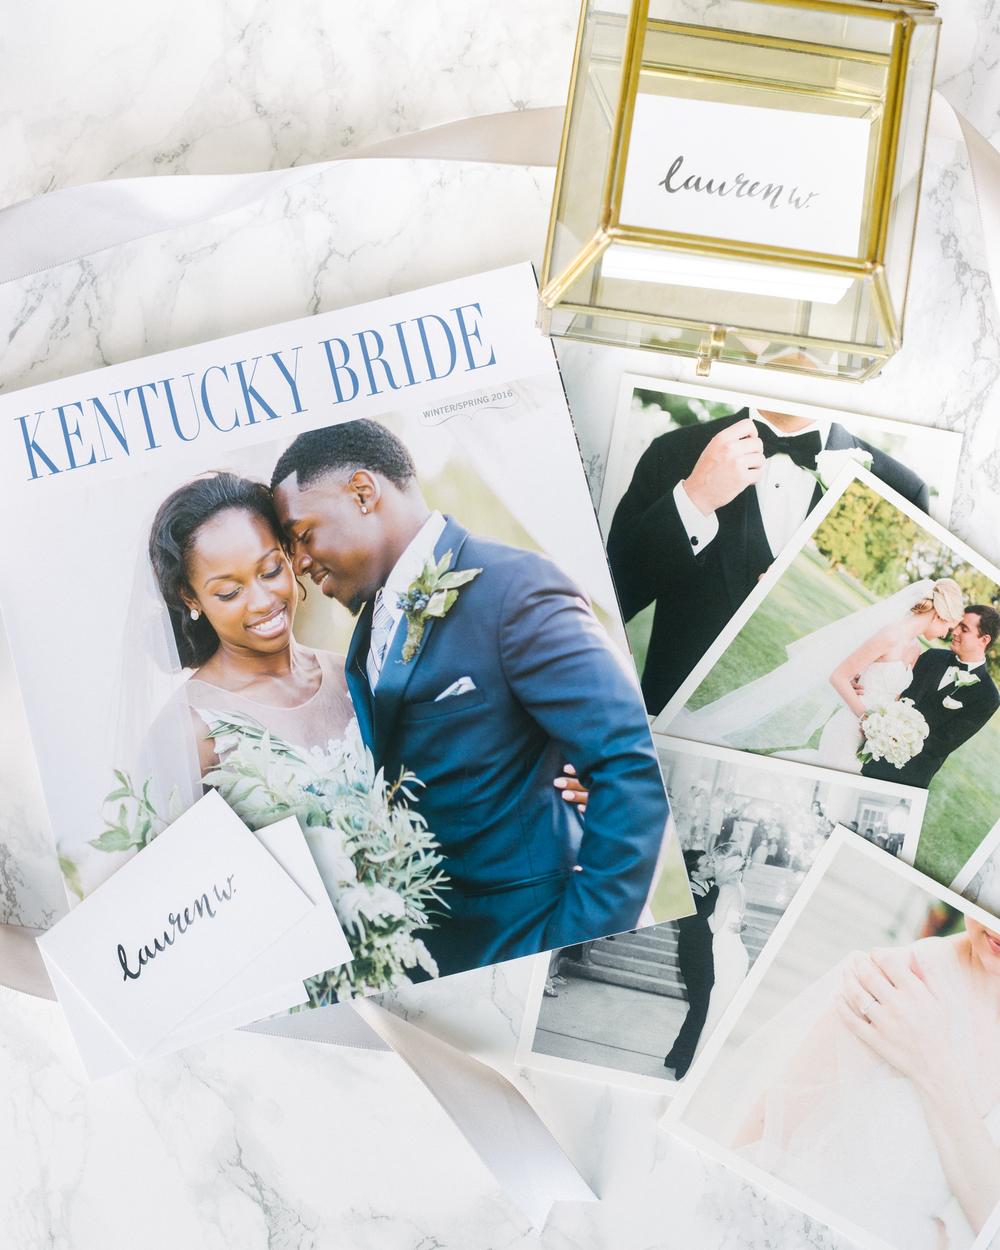 Kentucky Bride Photographer | Lauren W Photography